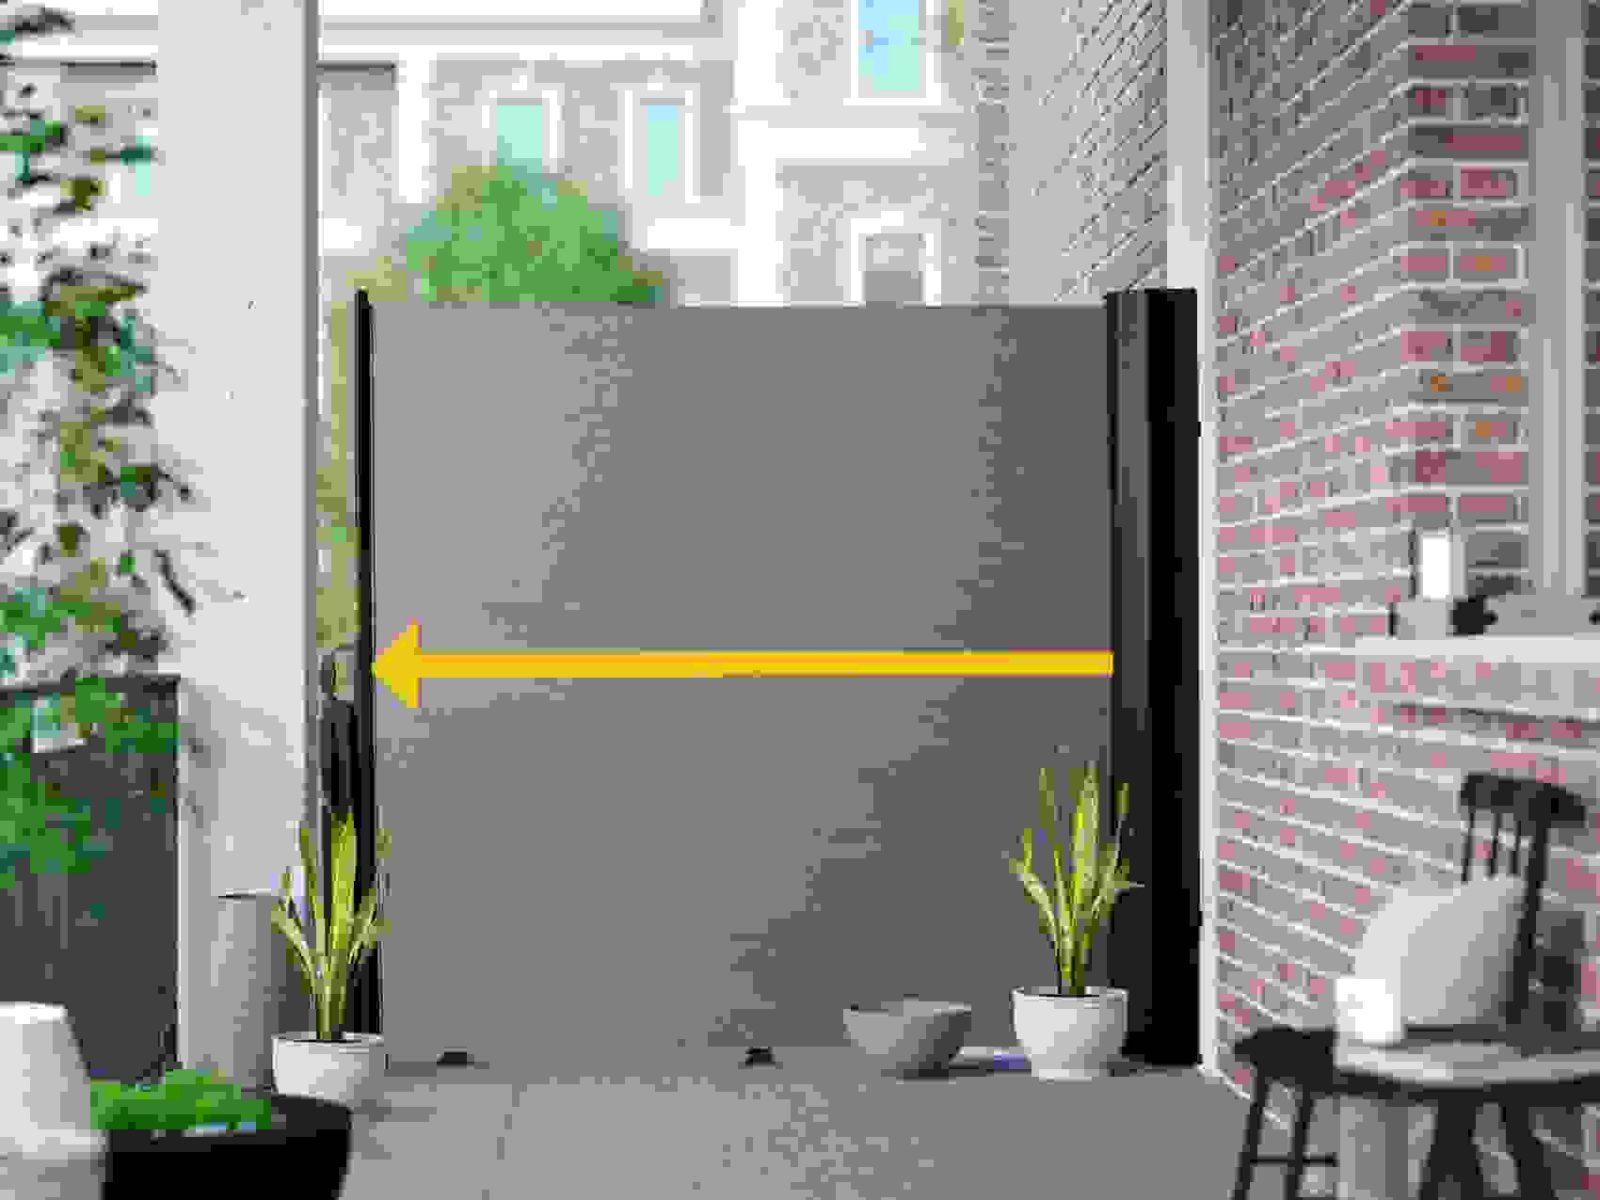 Windschutz Balkon Ohne Bohren Design Style Granit With Ist Frisch von Windschutz Balkon Ohne Bohren Photo